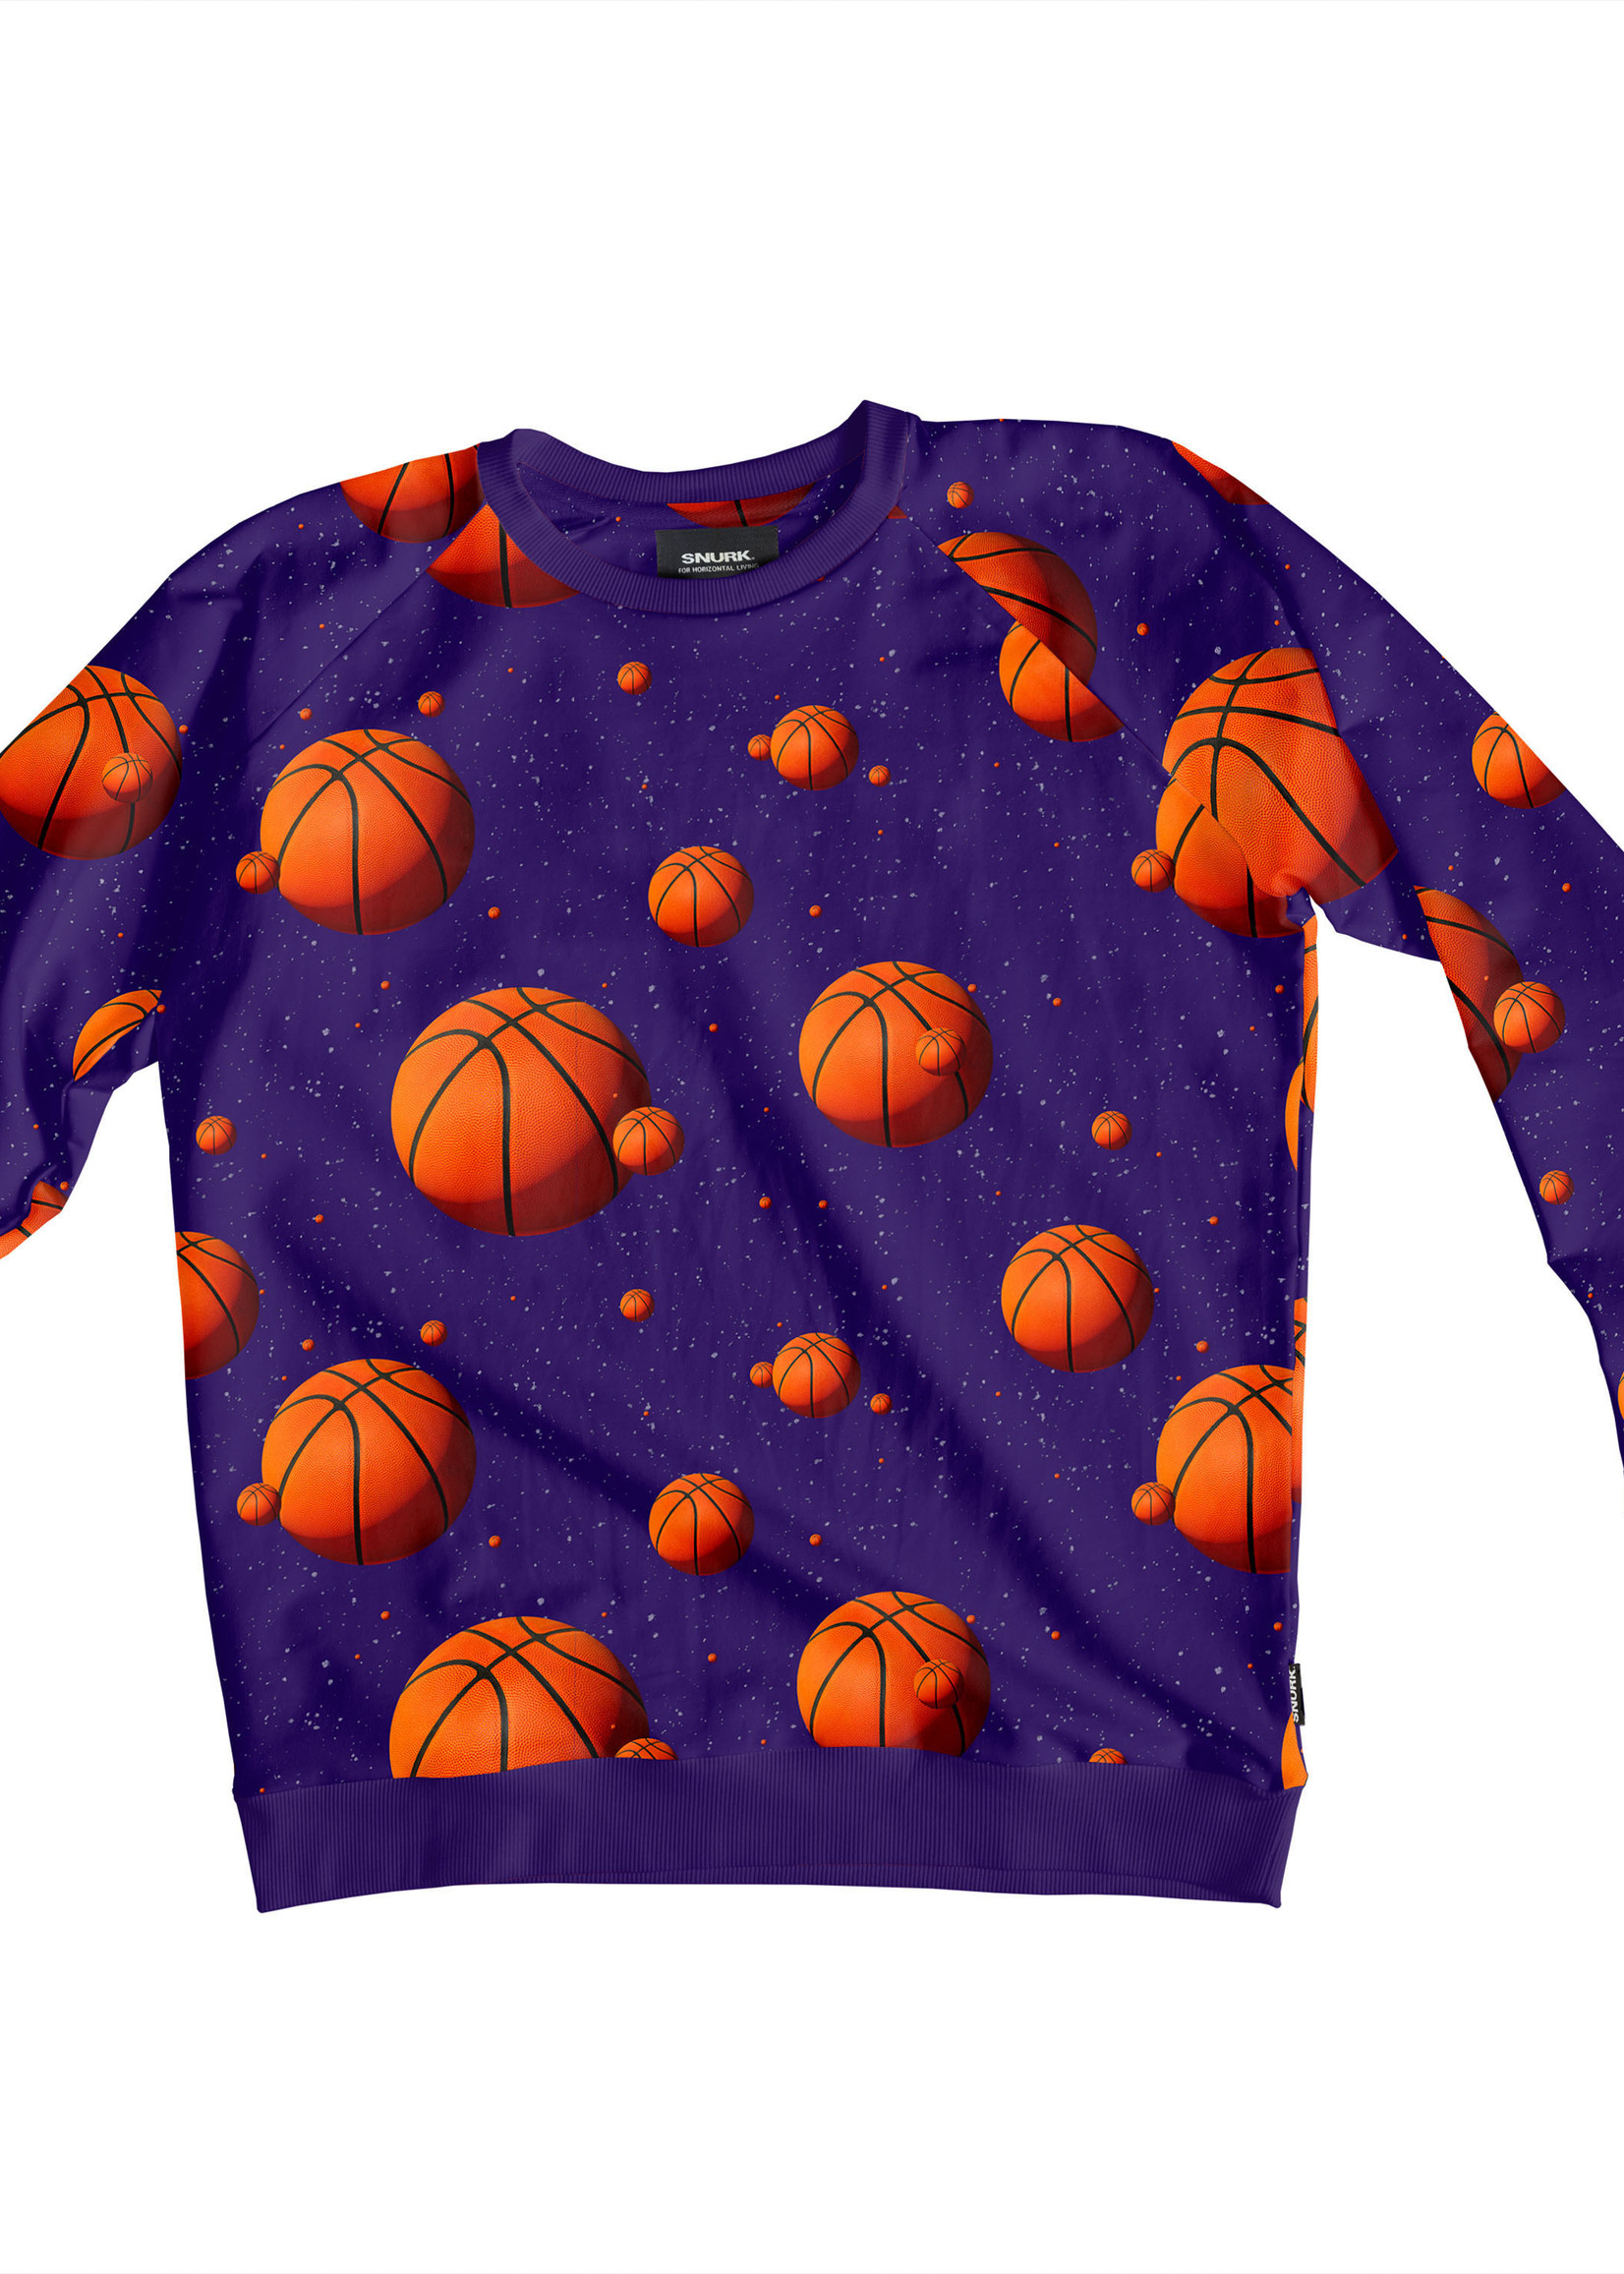 Snurk Basketball Stars Sweater